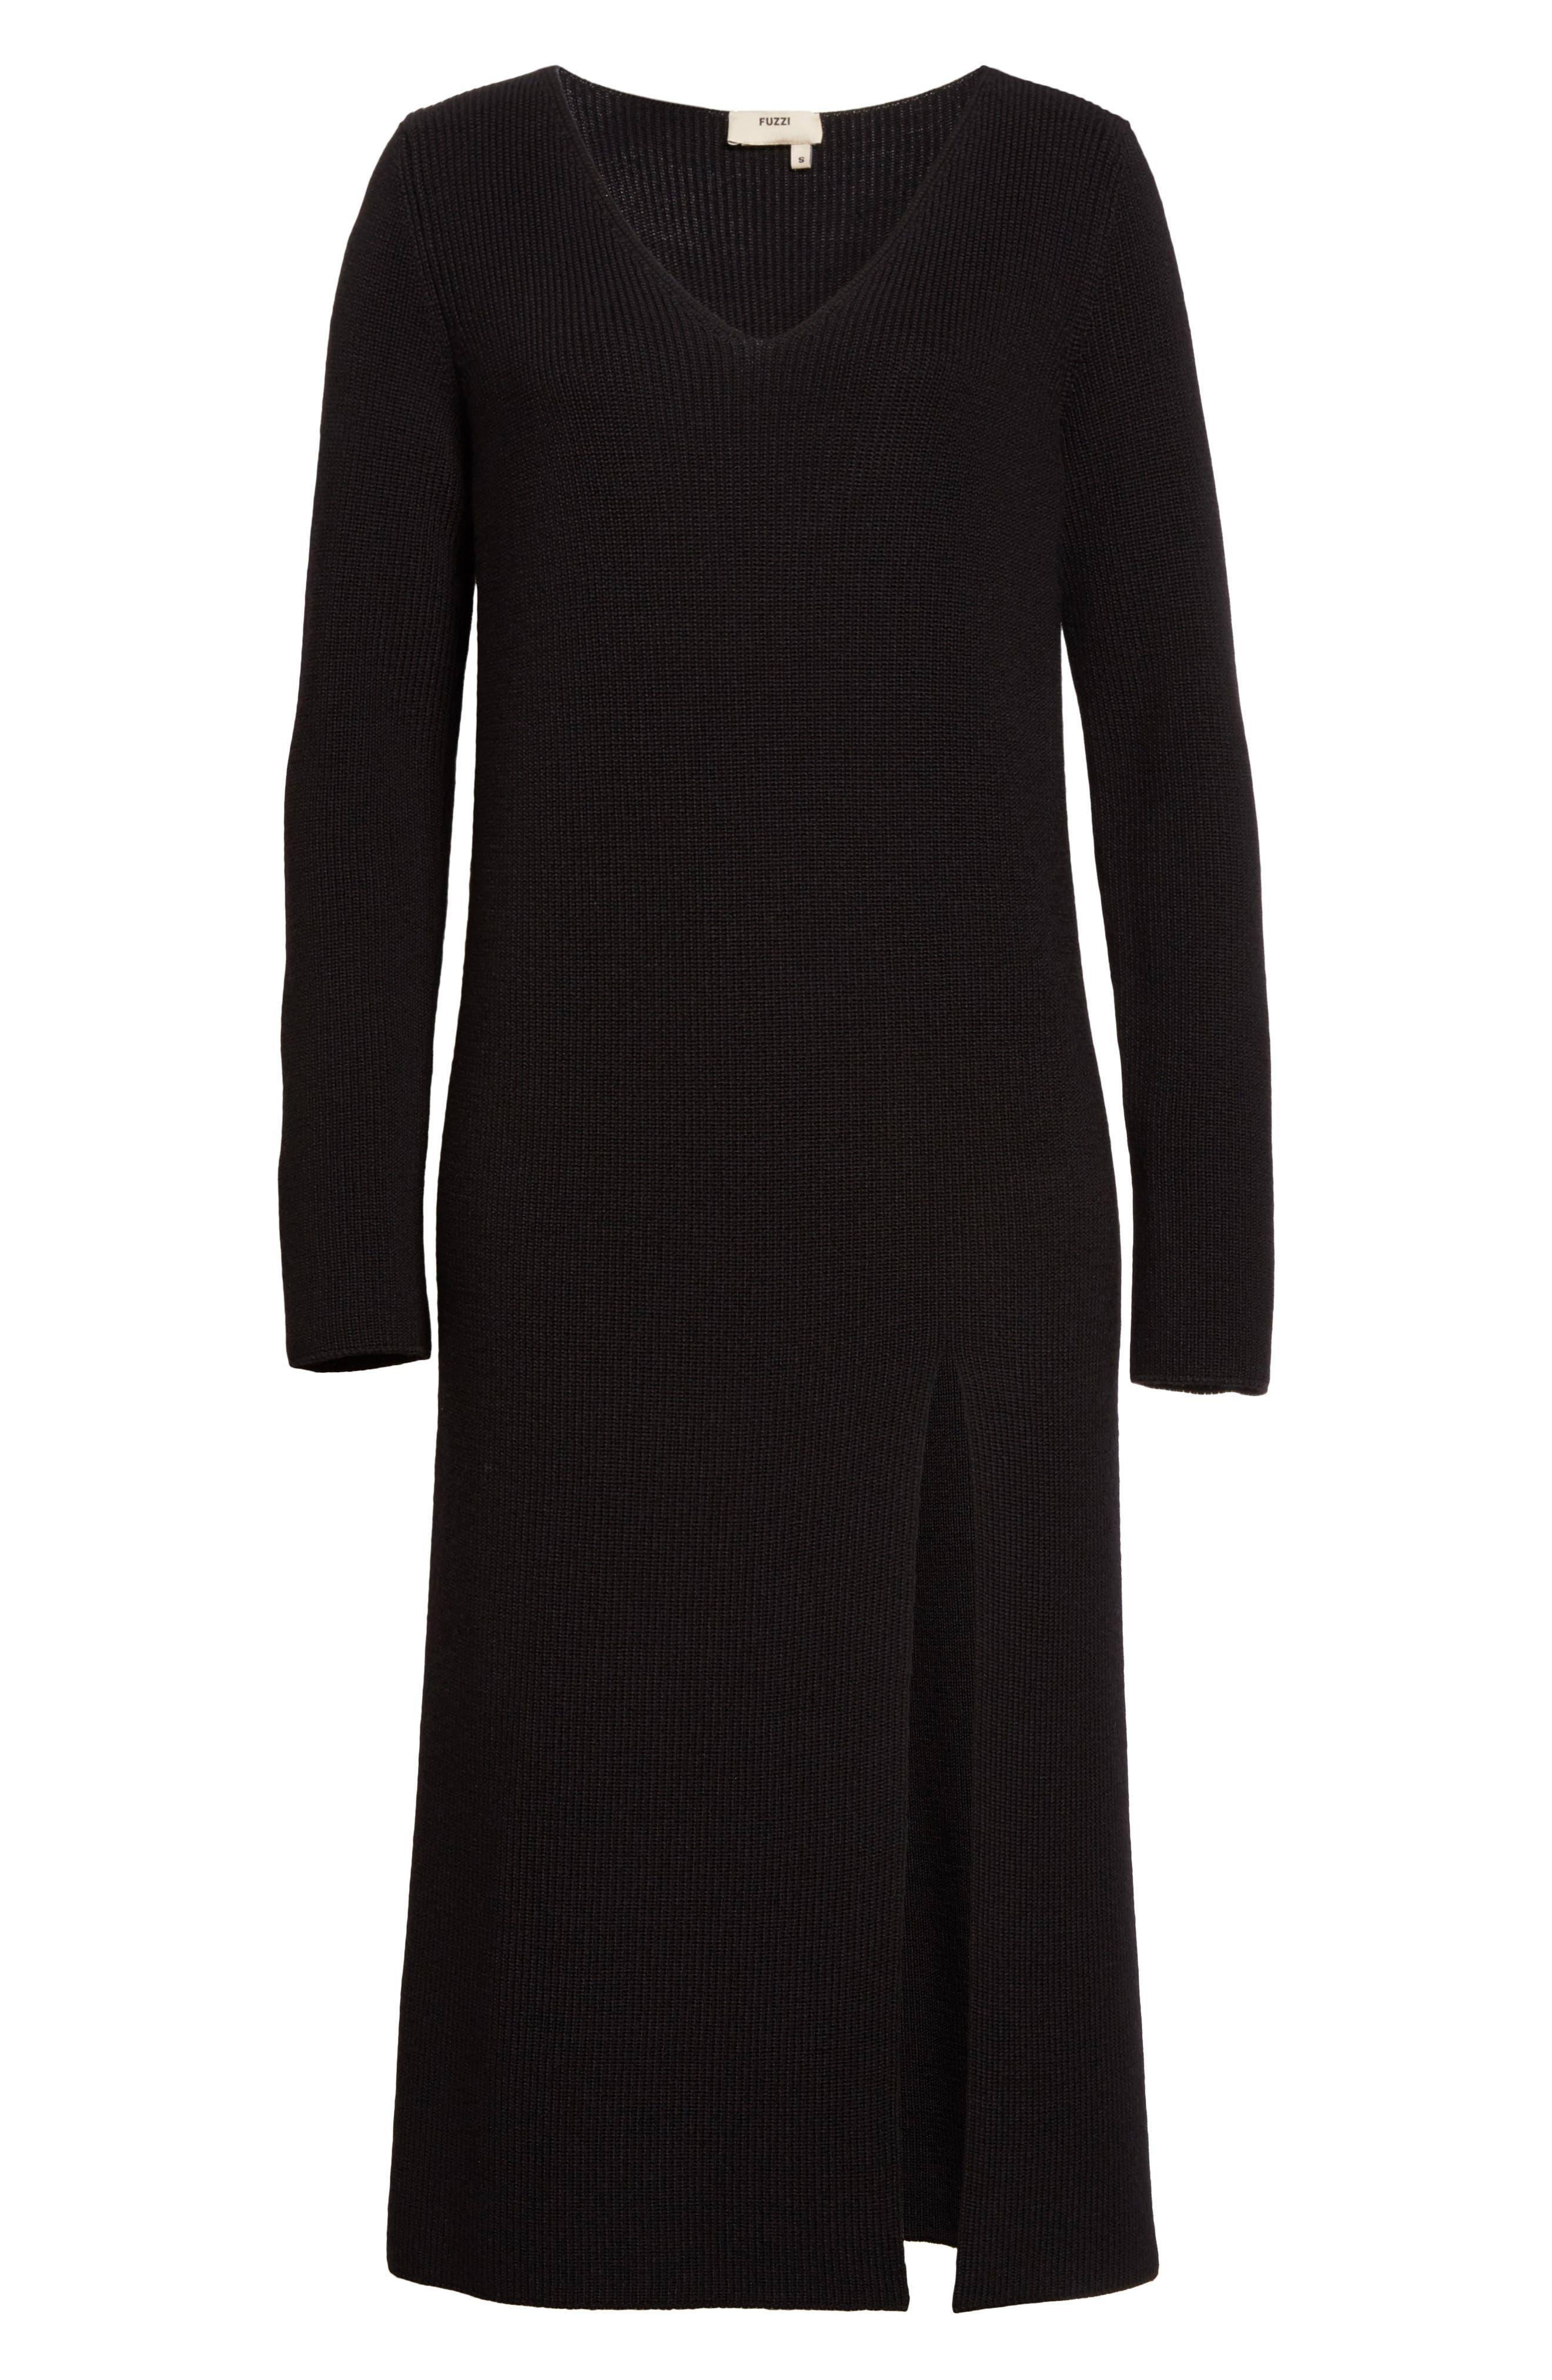 Virgin Wool Front Slit Tunic,                             Alternate thumbnail 7, color,                             Black